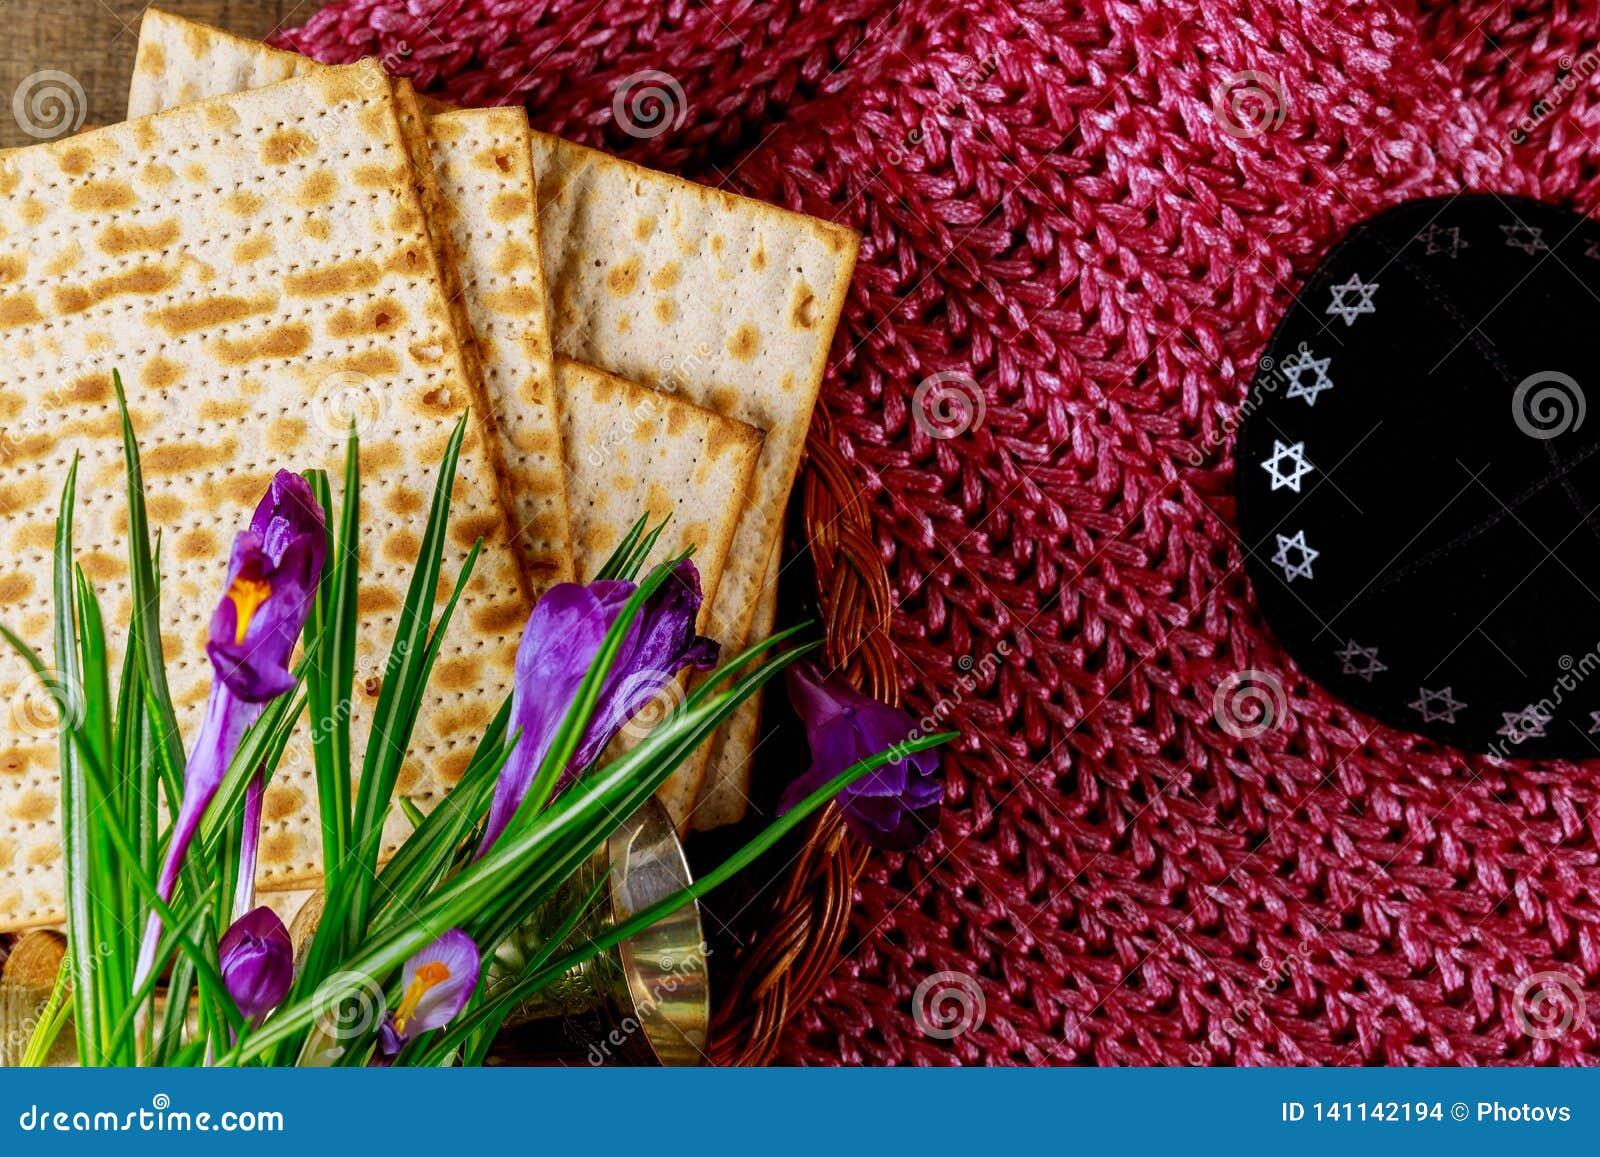 Símbolos de la pascua judía de Pesach del gran día de fiesta judío Matzoh, matzah o matzo tradicional